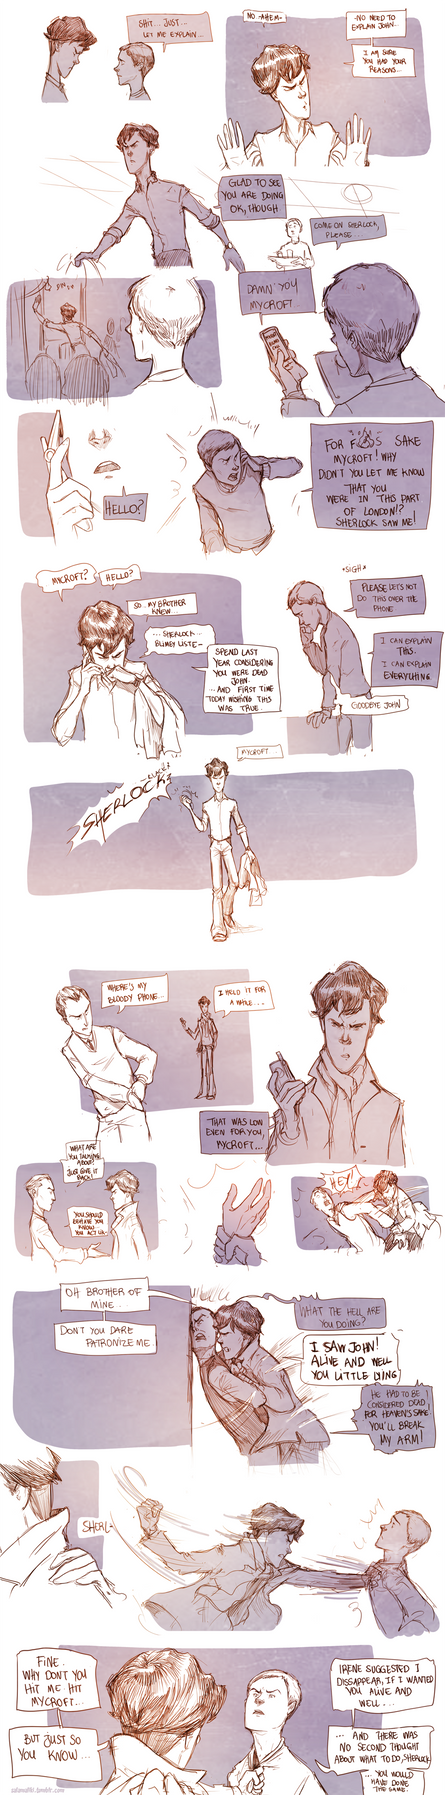 Teen Sherlock the returns of John Watson Pt2 by DrSlug